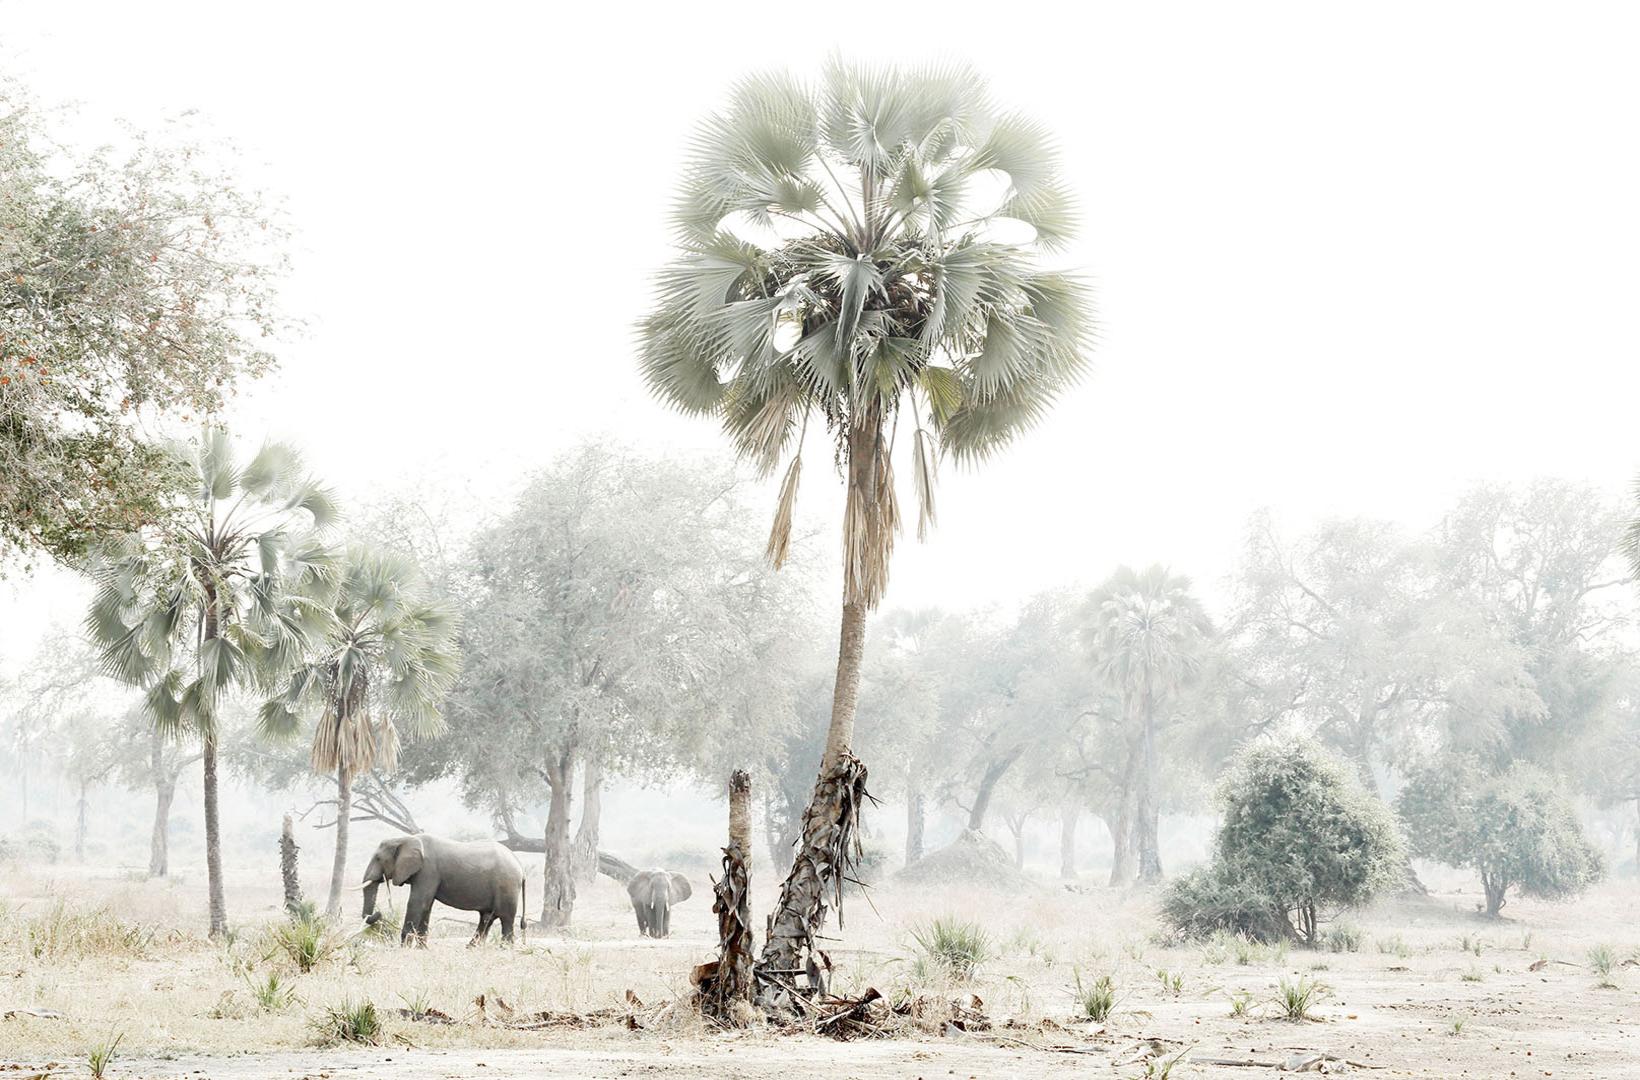 An African elephant wanders through the hazey landscape of Lower Zambezi Zambia where lala palms dot the treed landscape